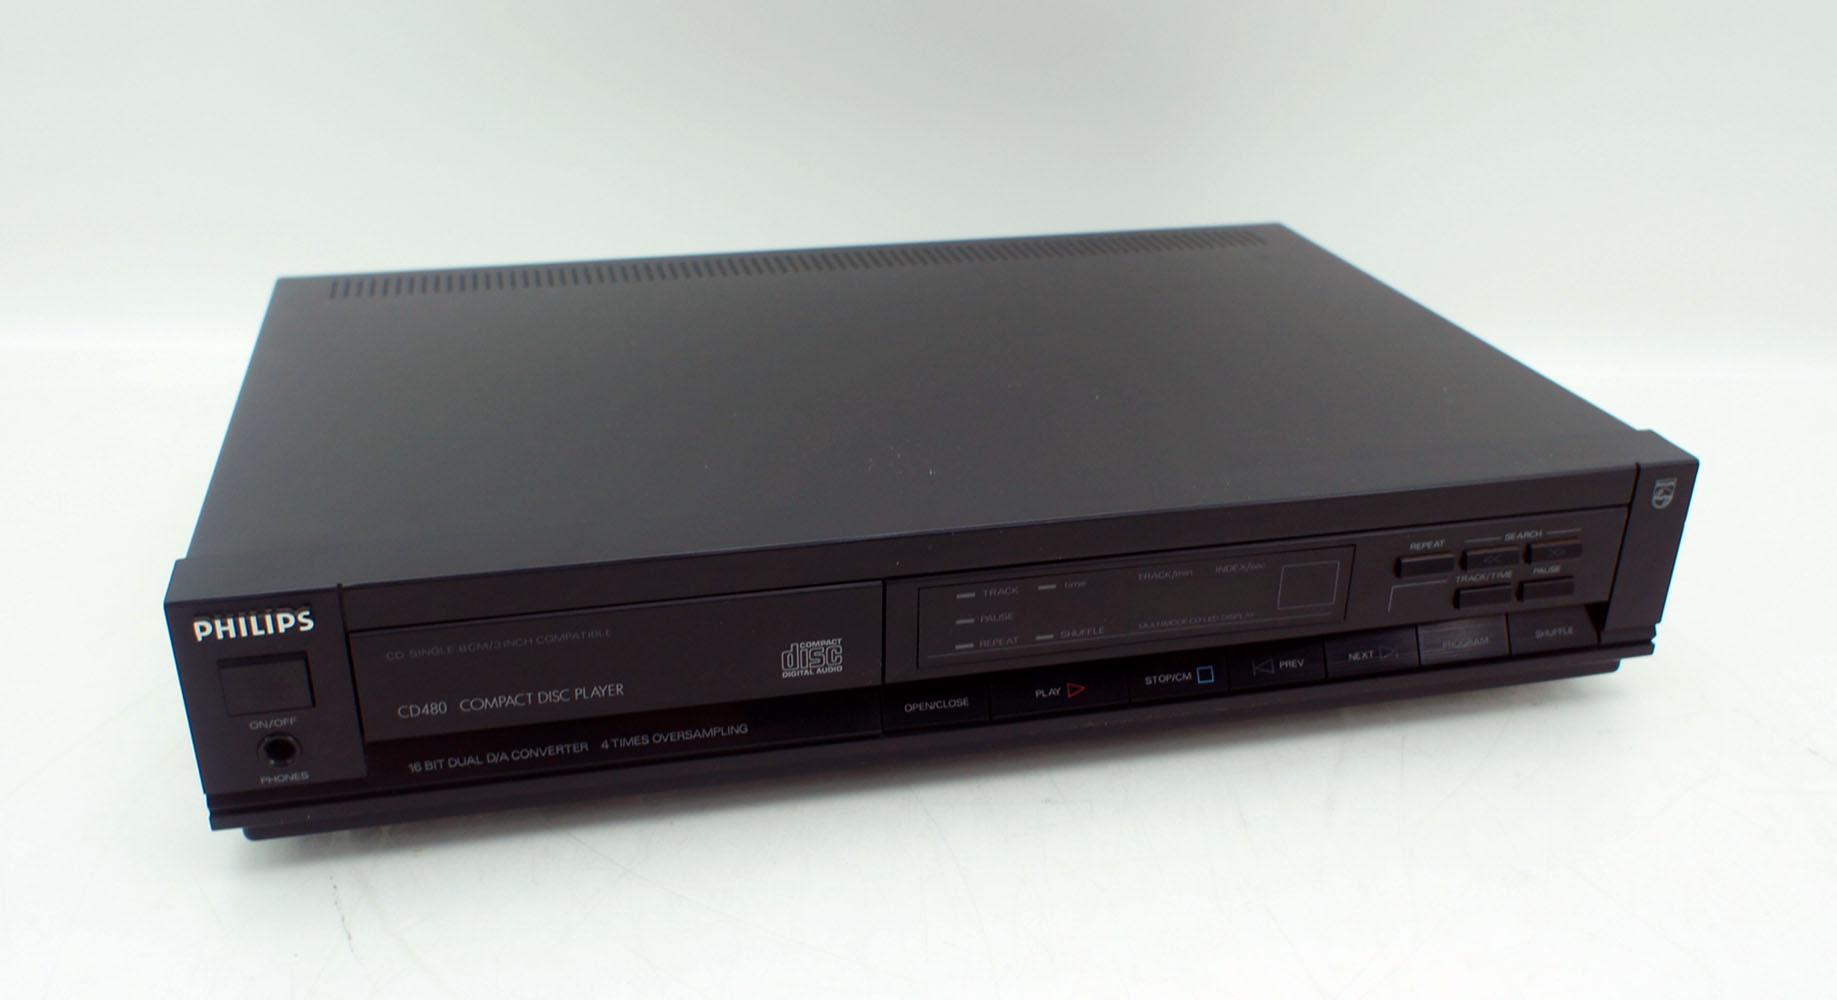 philips cd 480 30r cd player avec cdm 4 19 bras oscillant. Black Bedroom Furniture Sets. Home Design Ideas